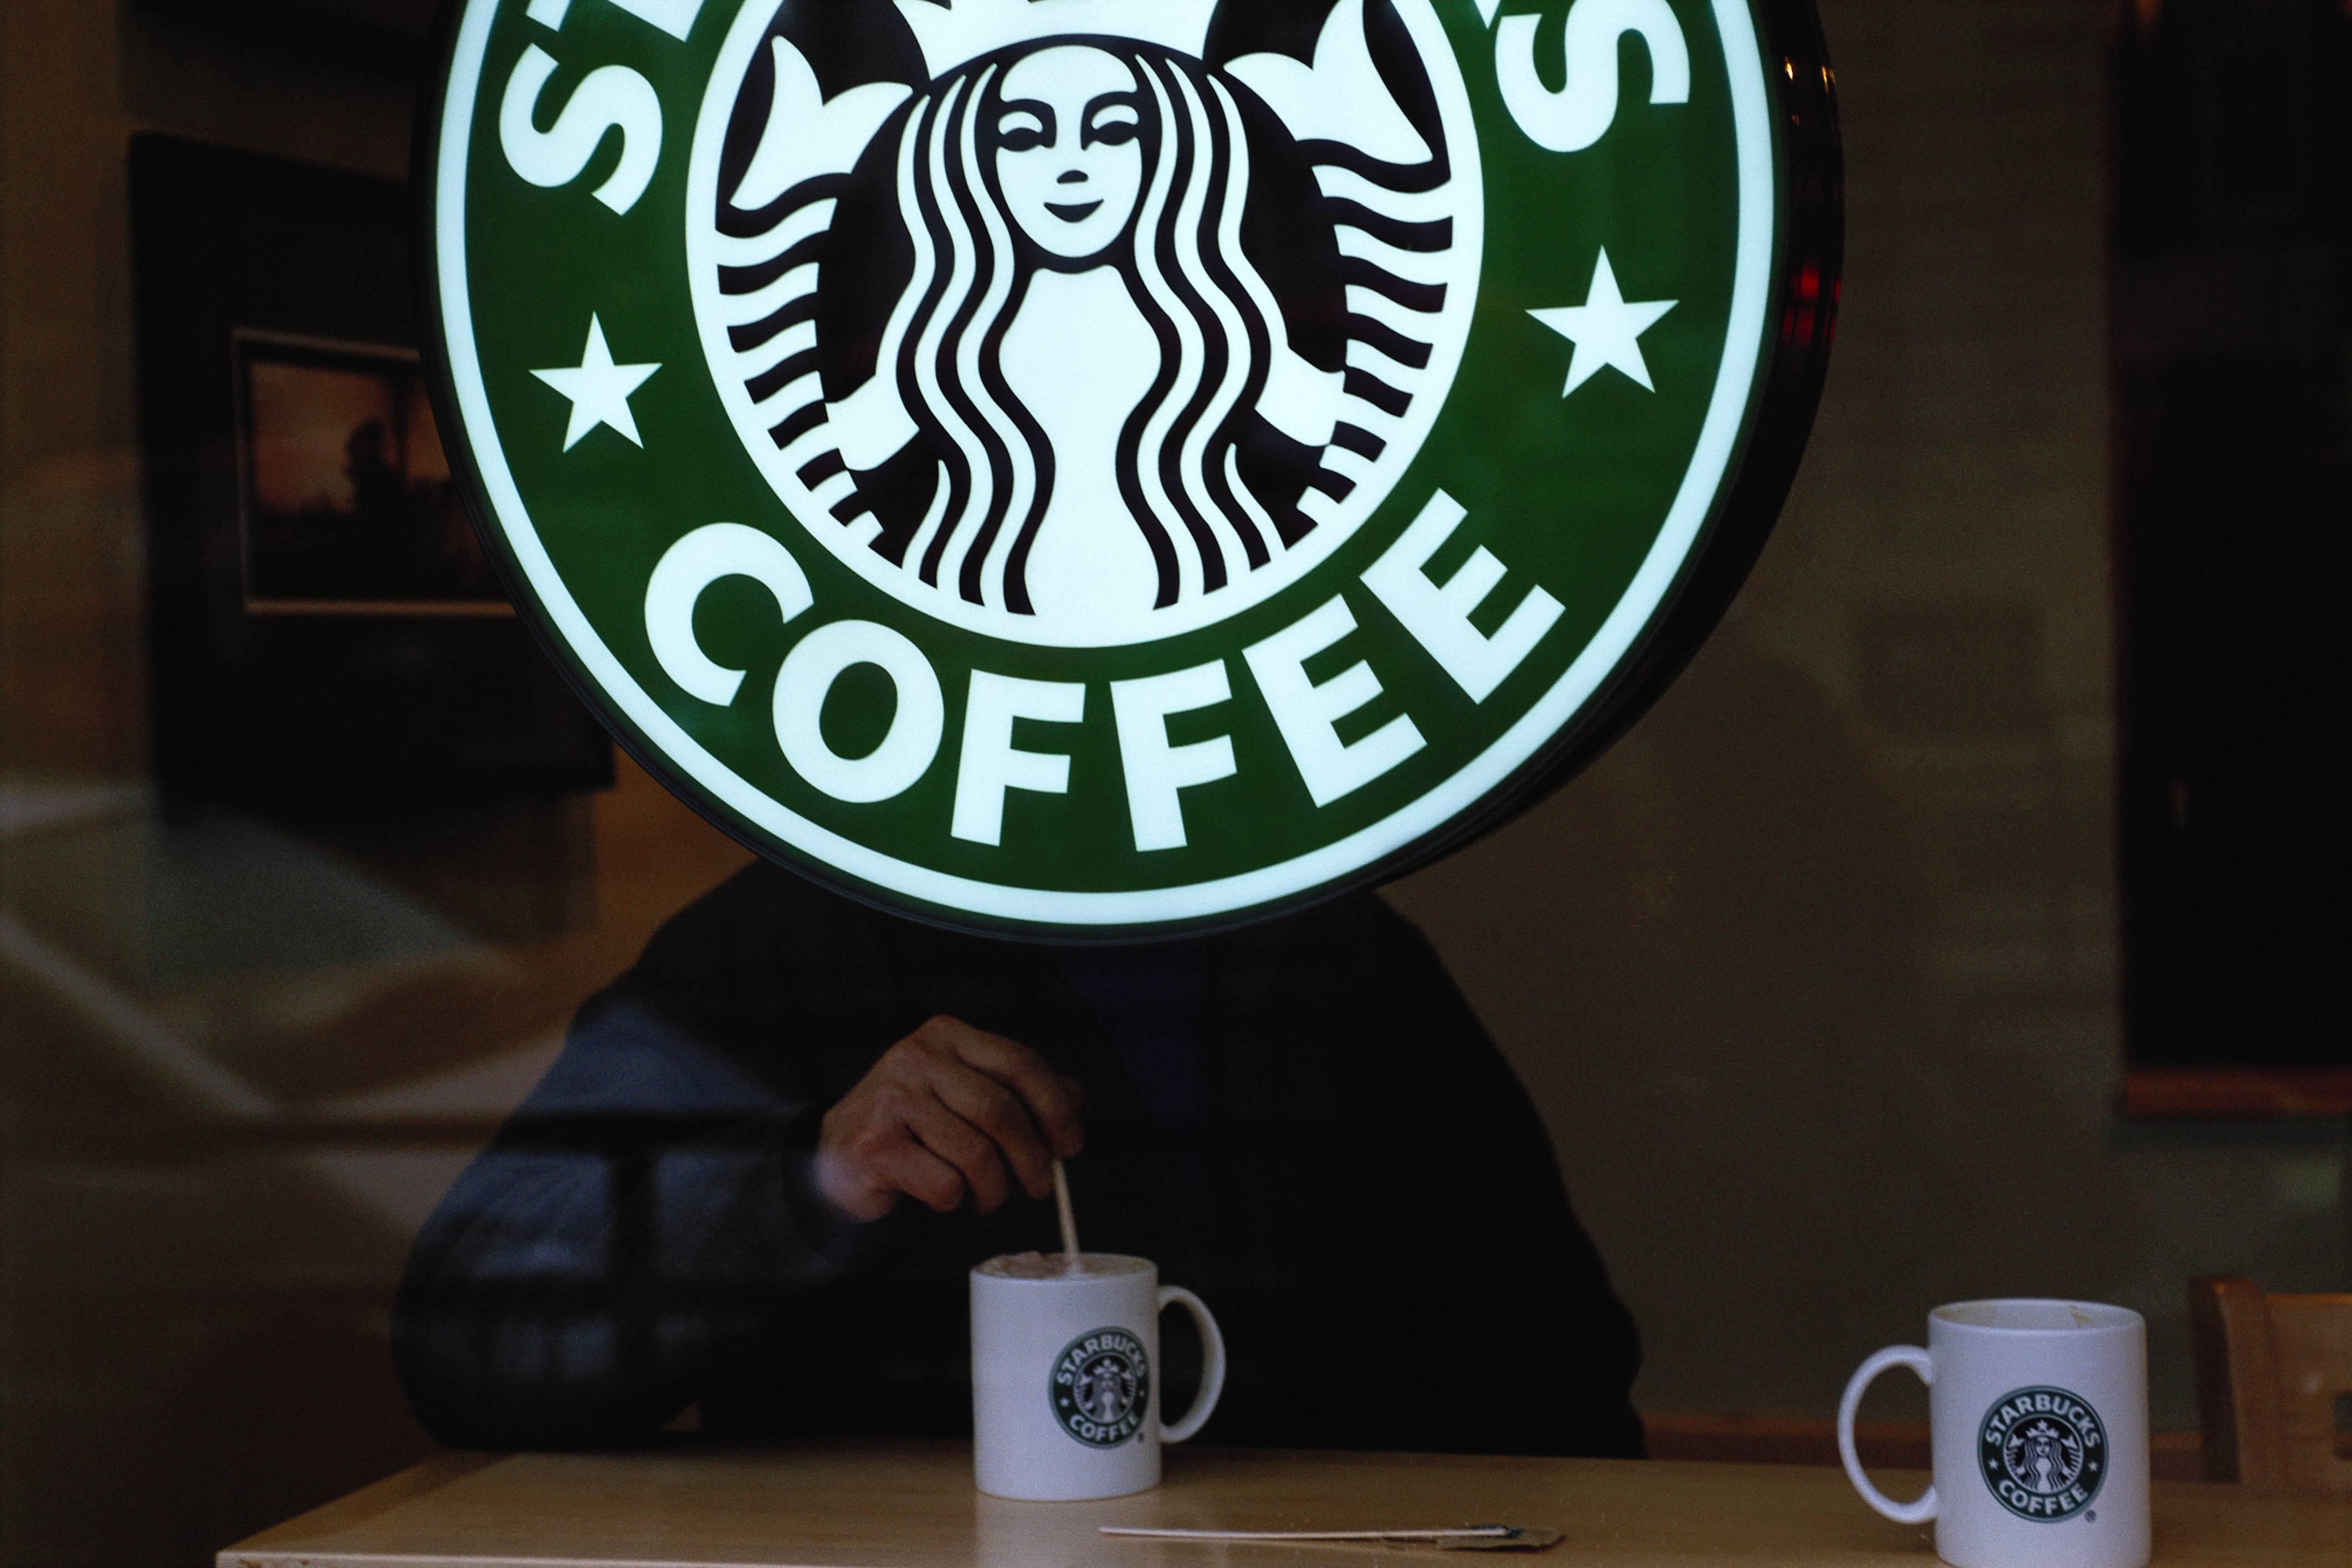 Customer Behind Starbucks Sign in London